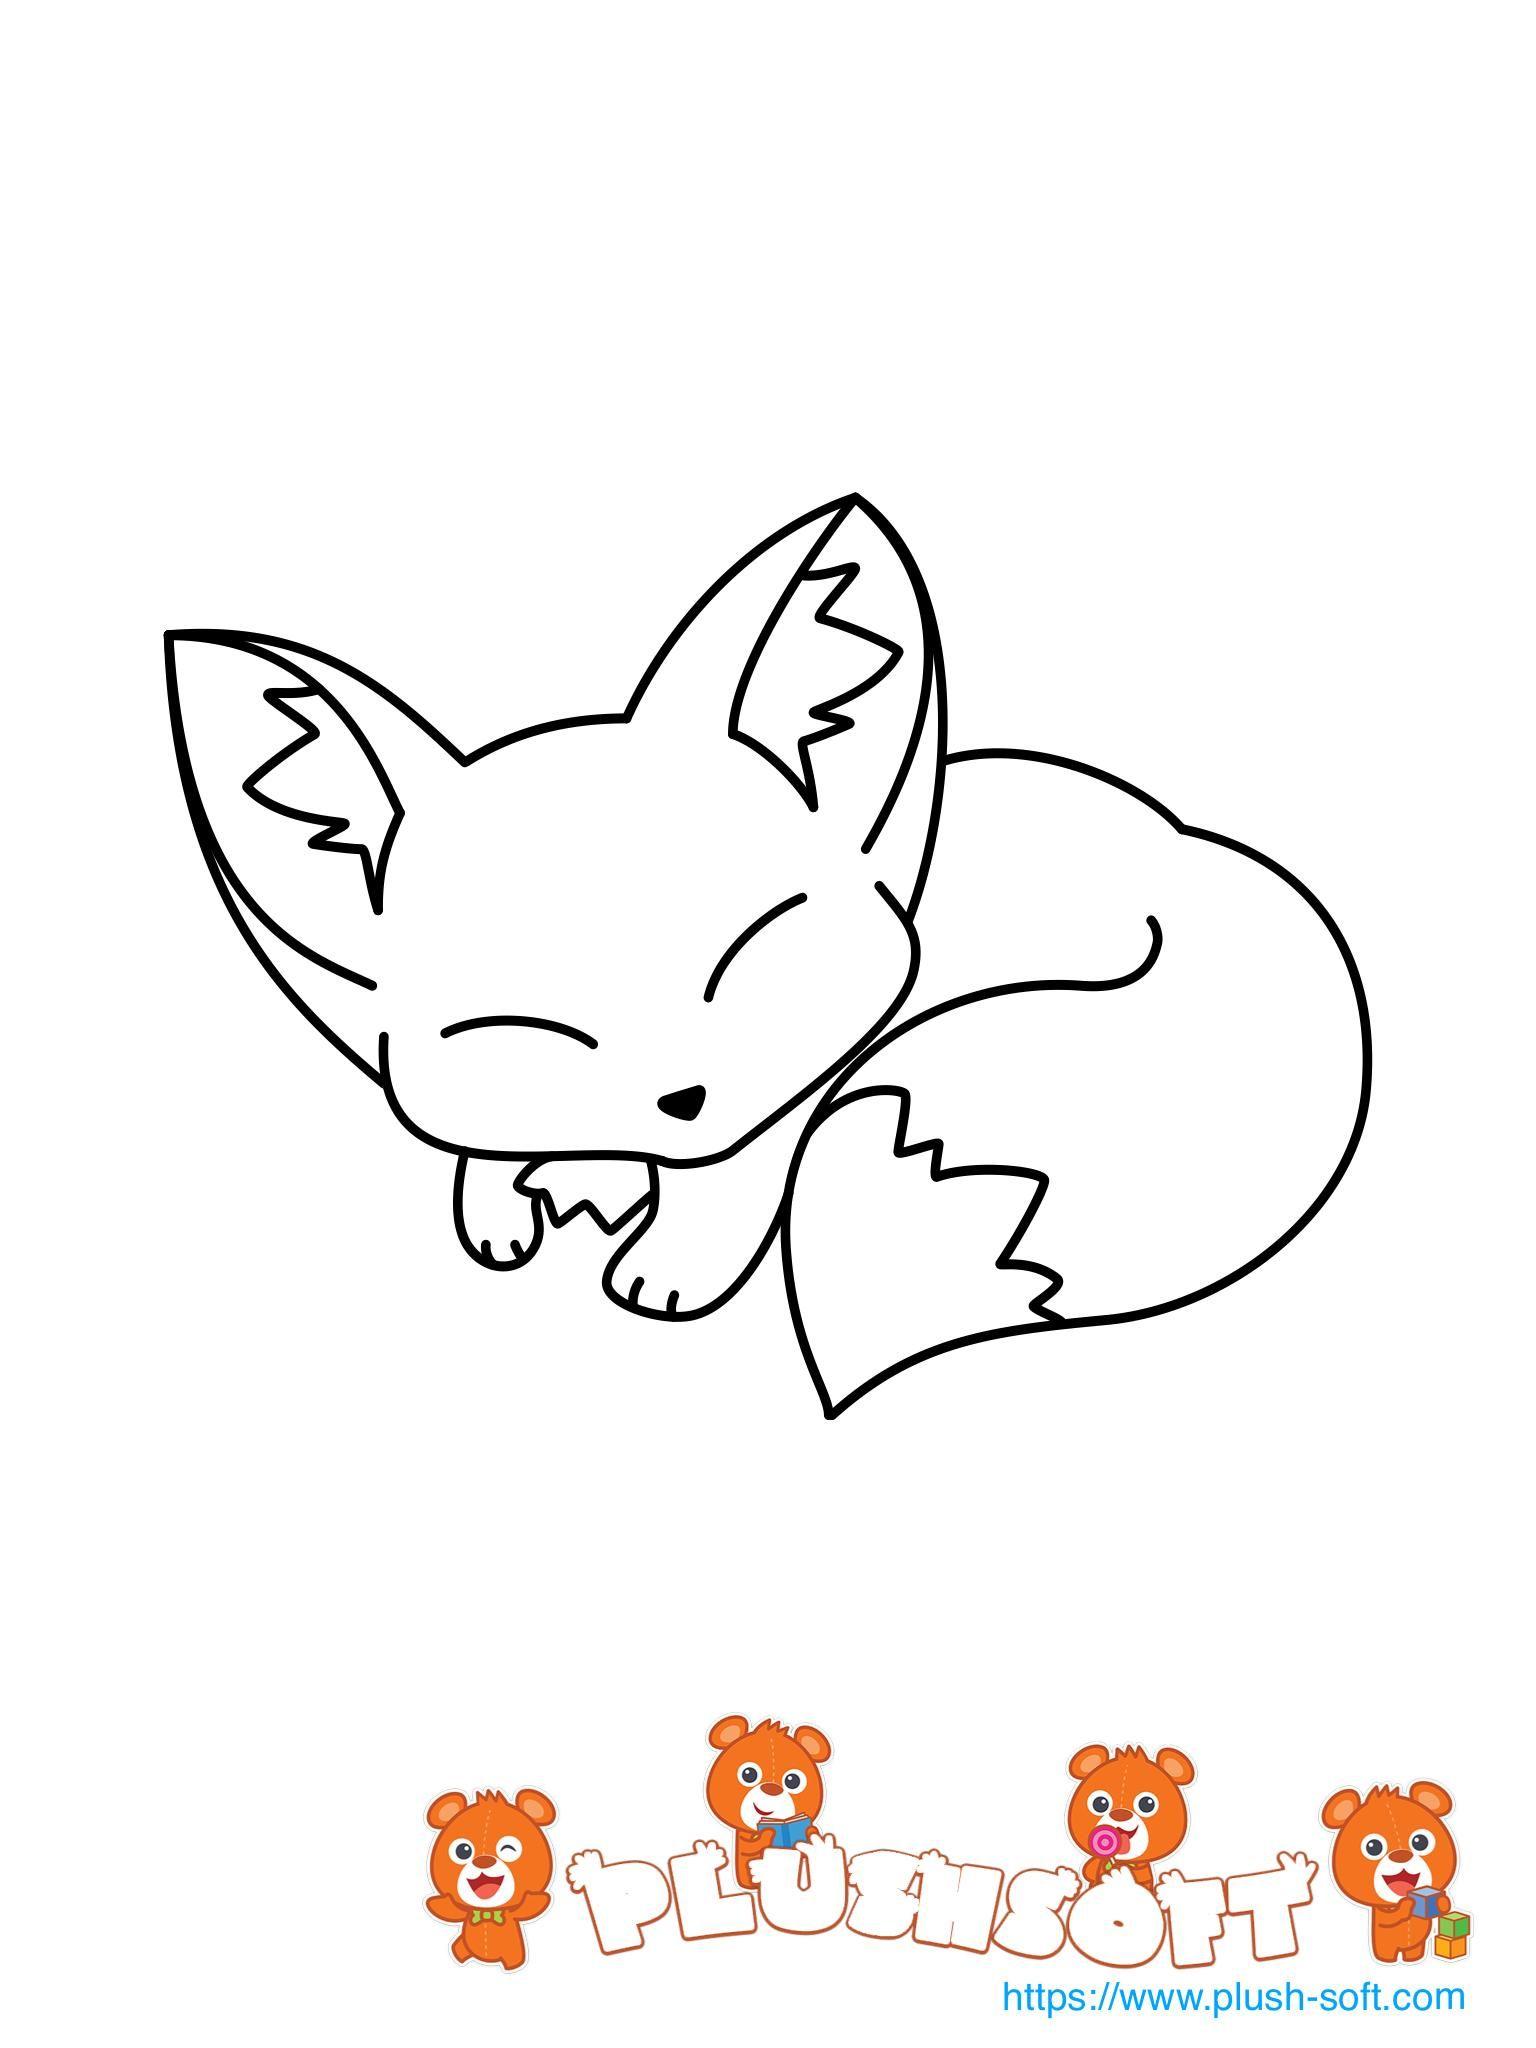 18 Coloring Page Cute Fox Fox Coloring Page Cute Coloring Pages Coloring Pages